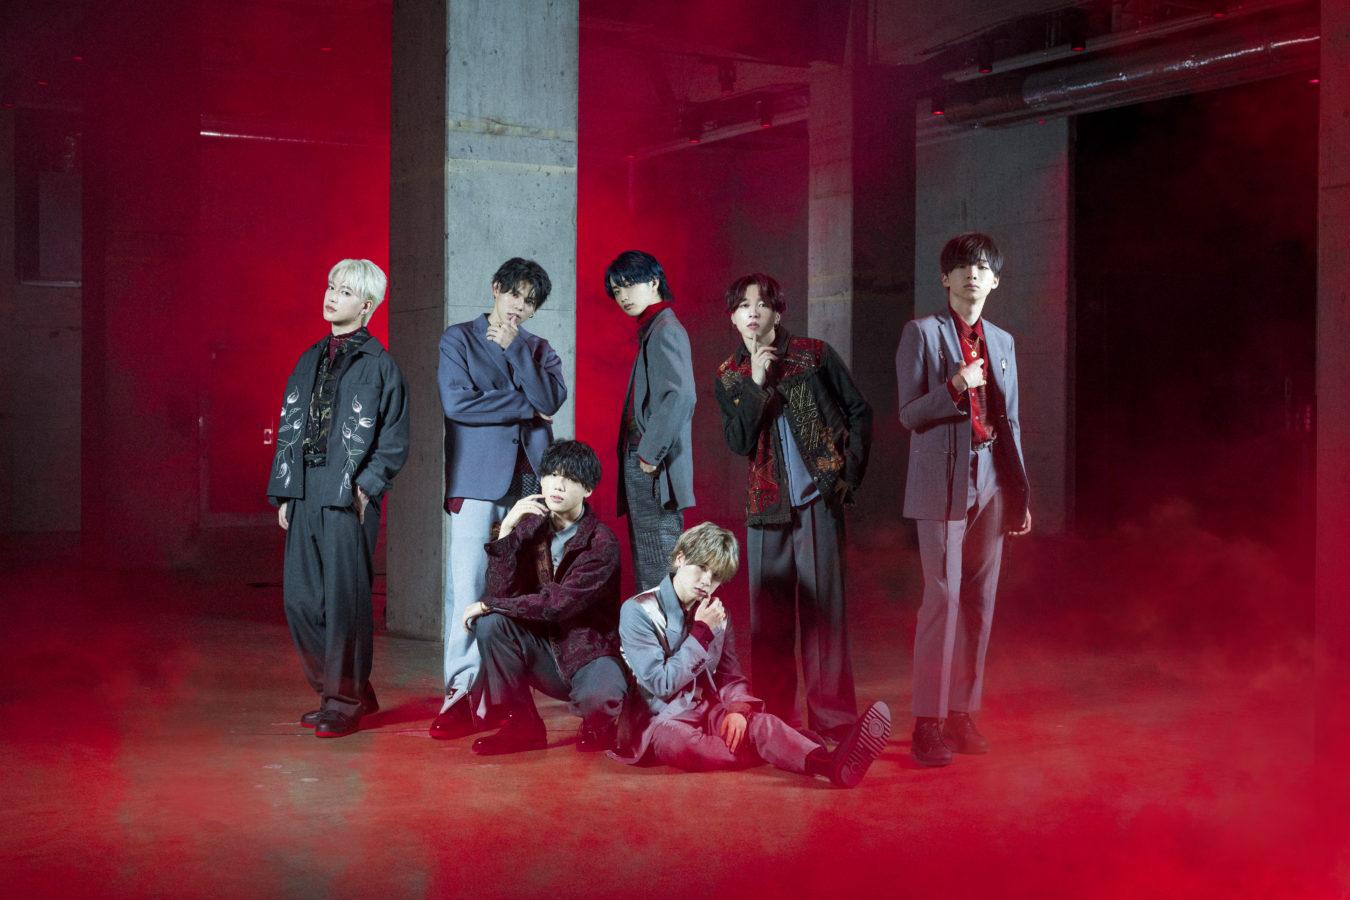 SOTA、SHUNTO、MANATO、RYUHEI、JUNON、RYOKI、LEOの7人組ダンス&ボーカルユニット、BE:FIRST